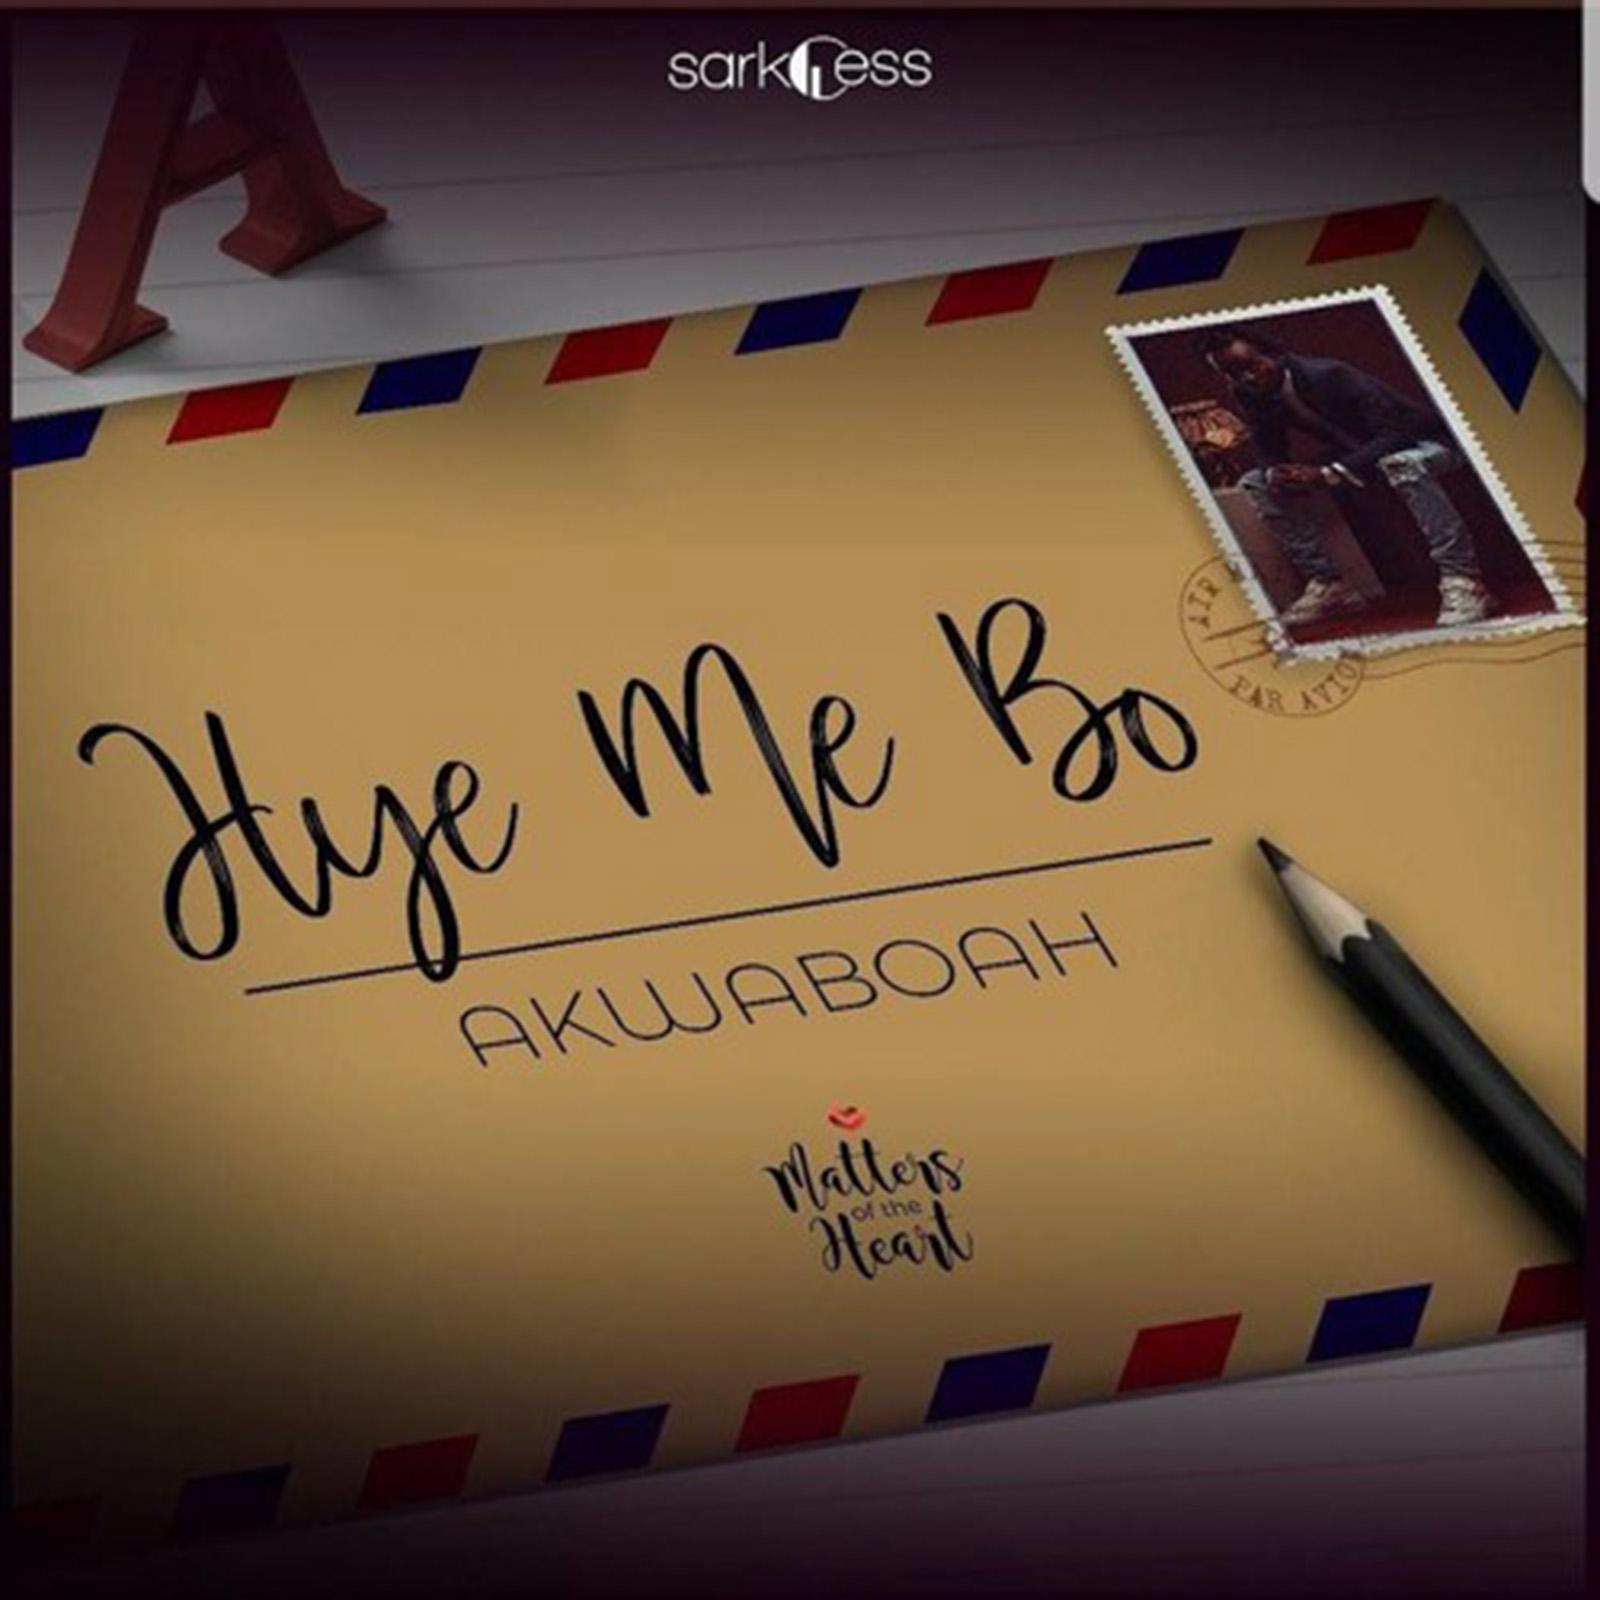 Hye Me Bo by Akwaboah